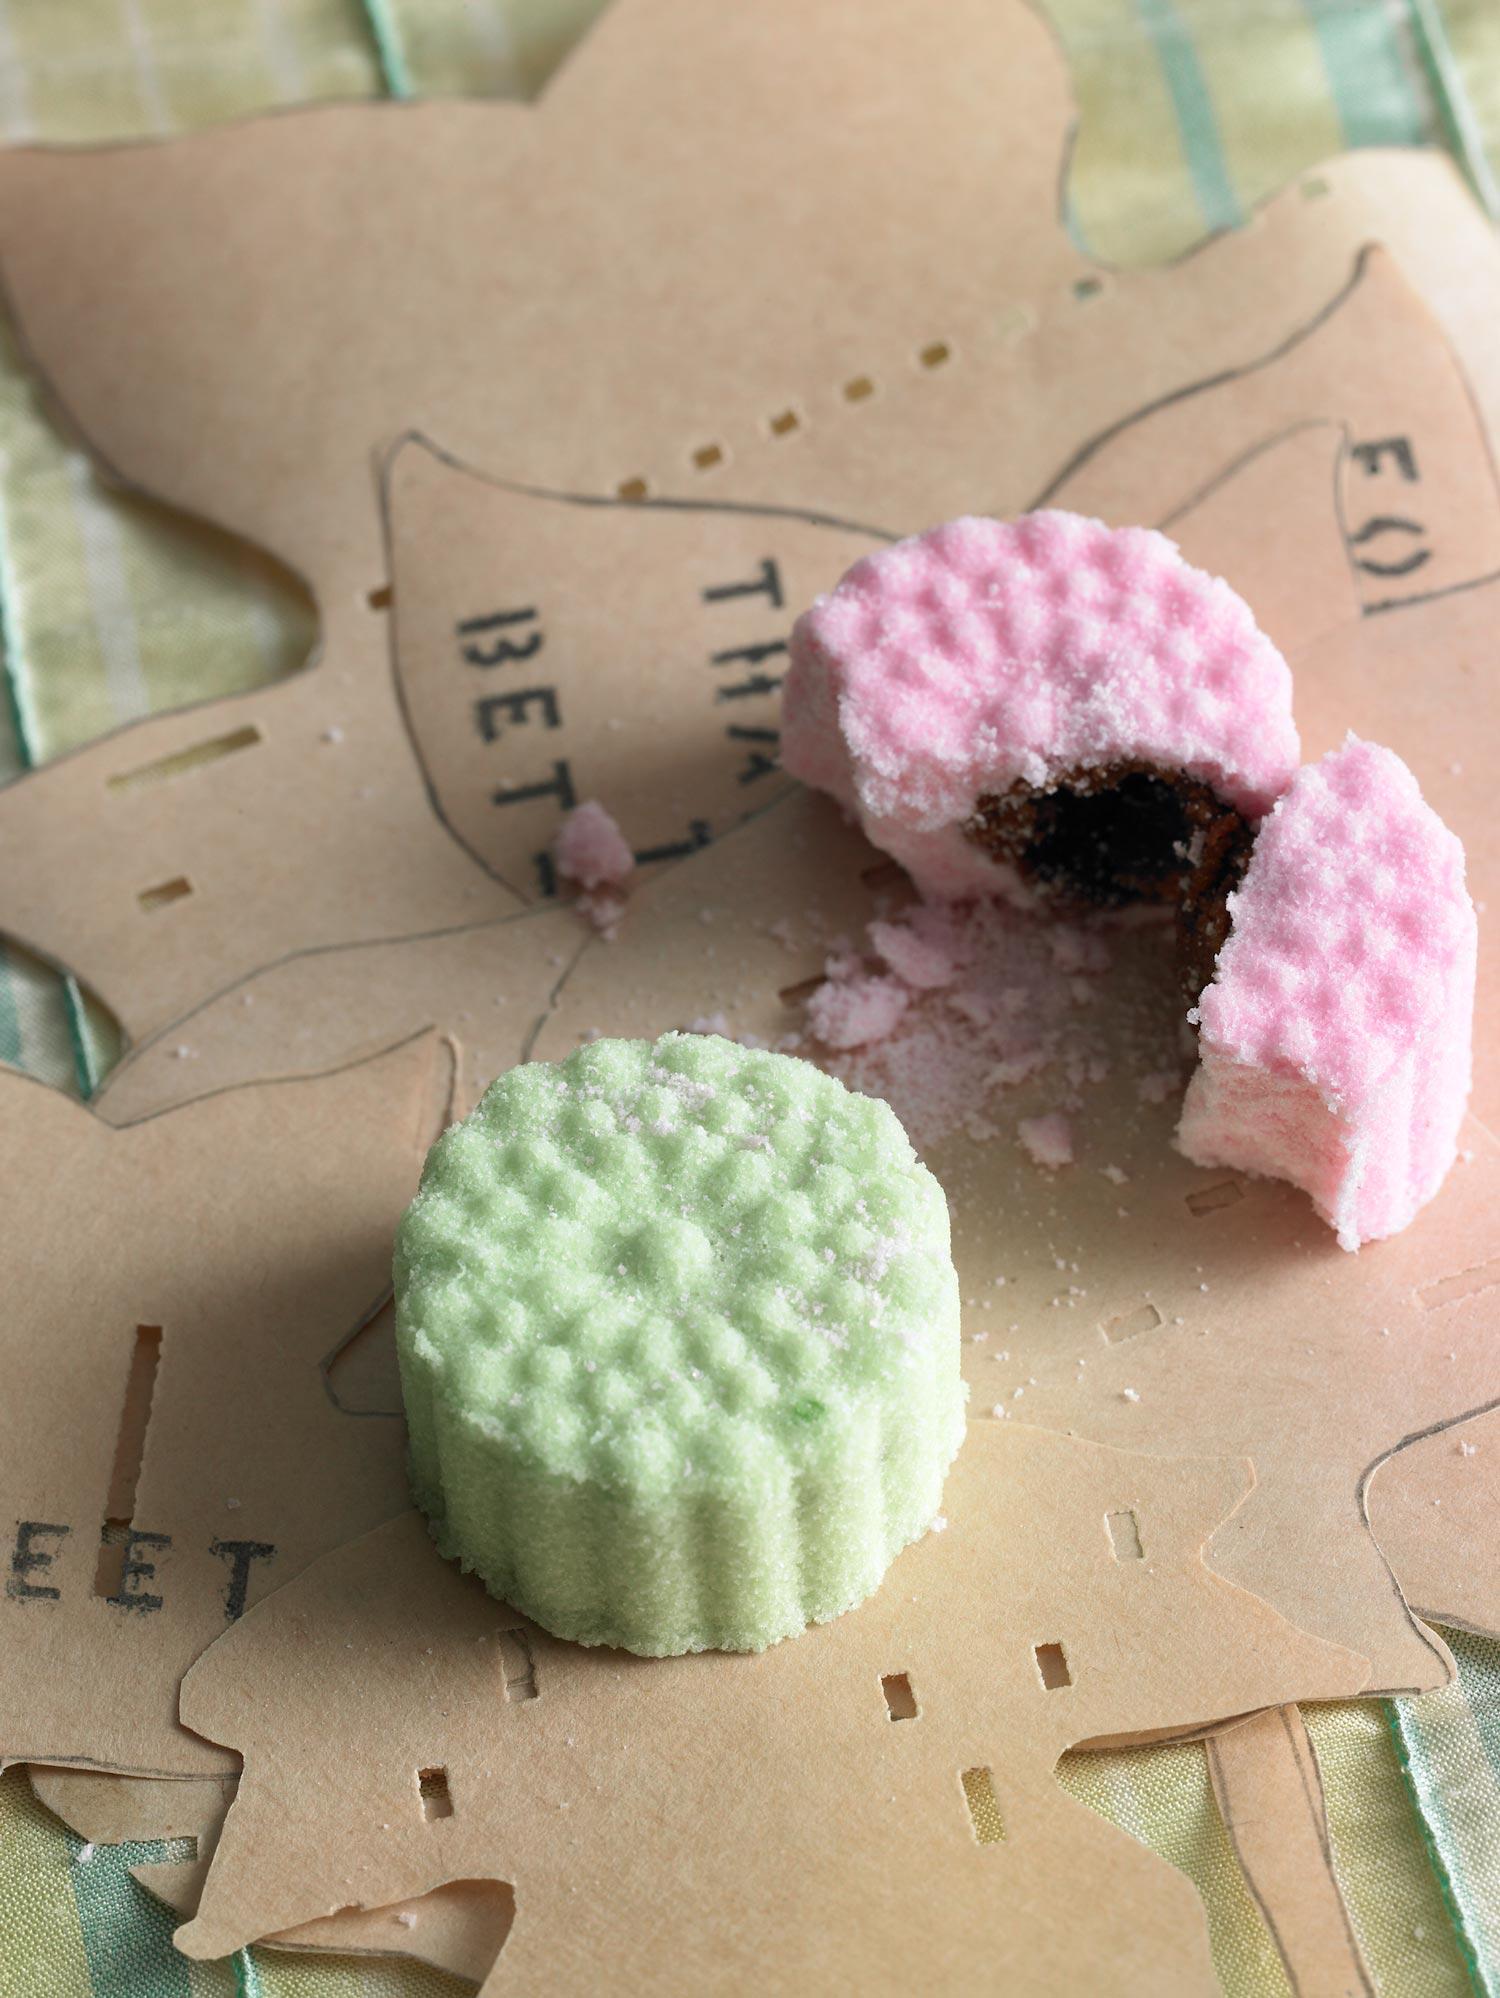 pink-and-green-treats.jpg